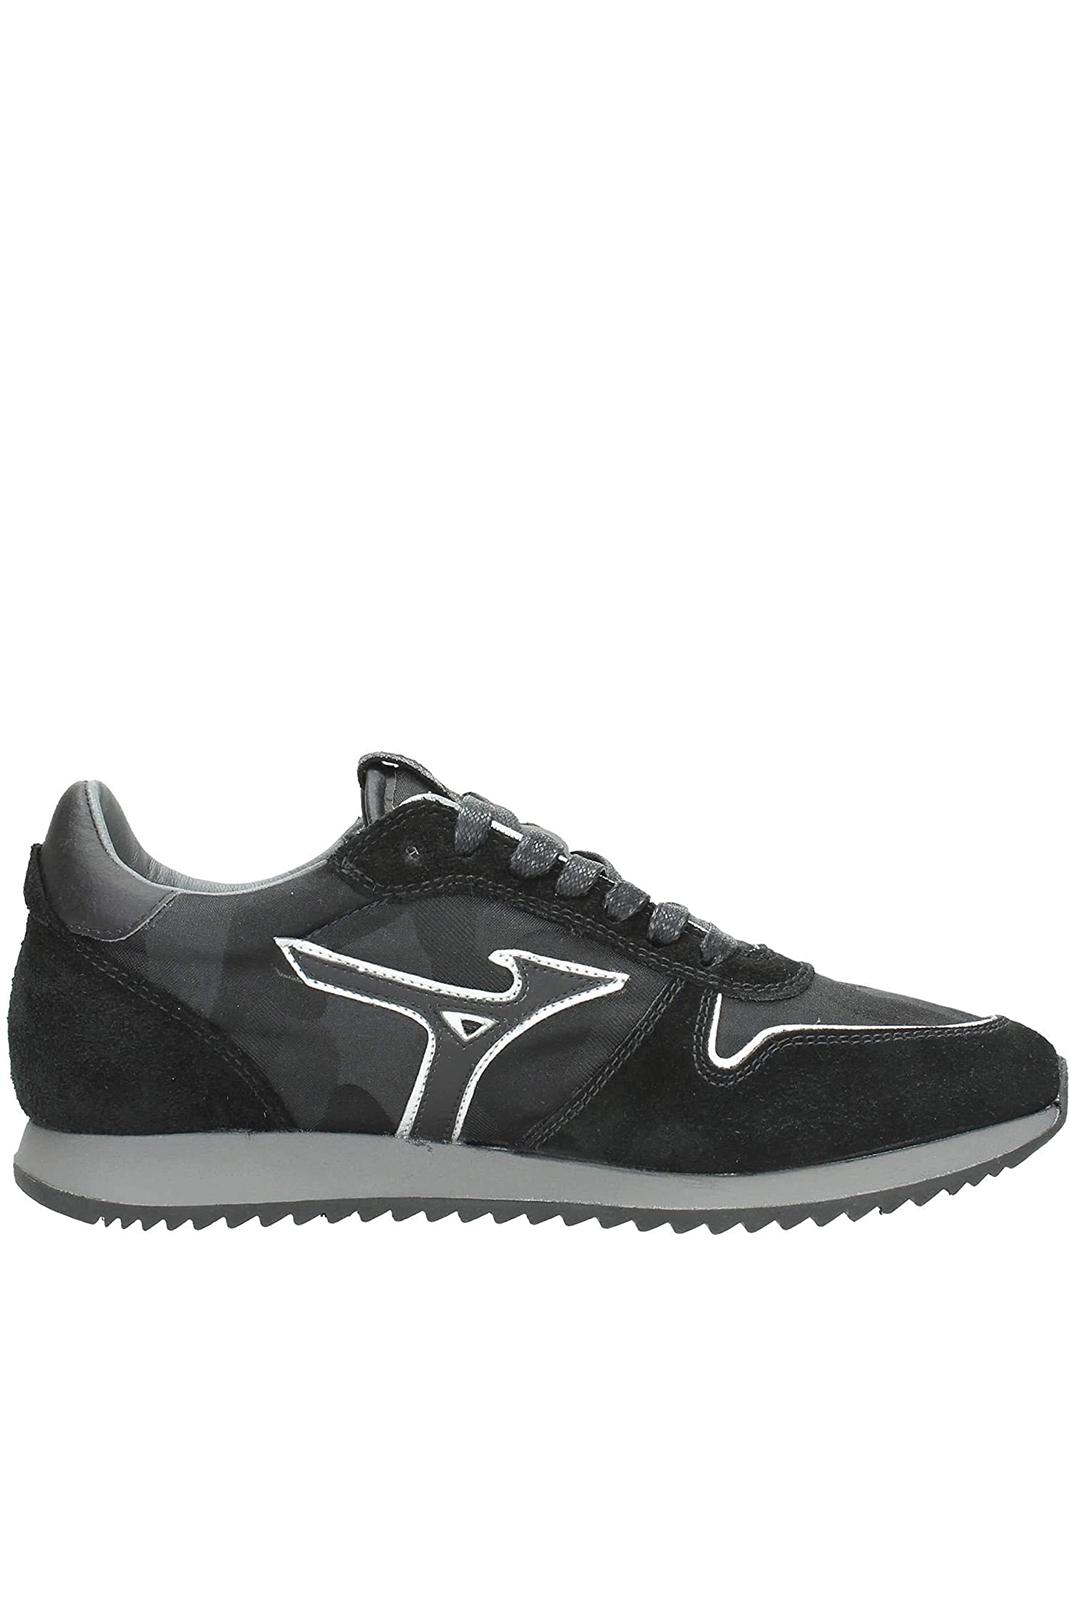 Chaussures   Mizuno D1GE181209 ETAMIN 2 GREY/BLACK/BLAC